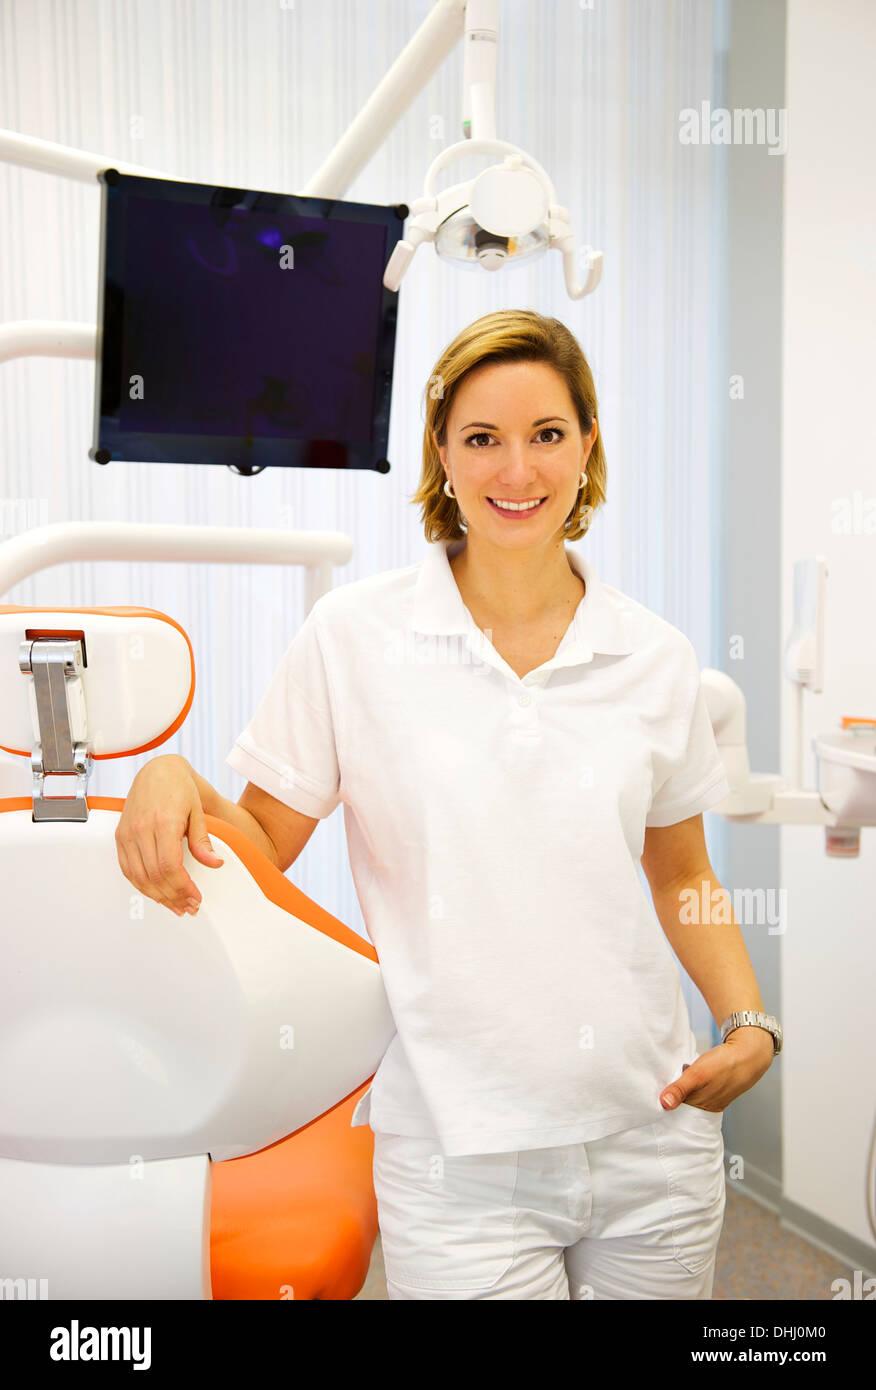 Portrait of female dentist in clinic - Stock Image